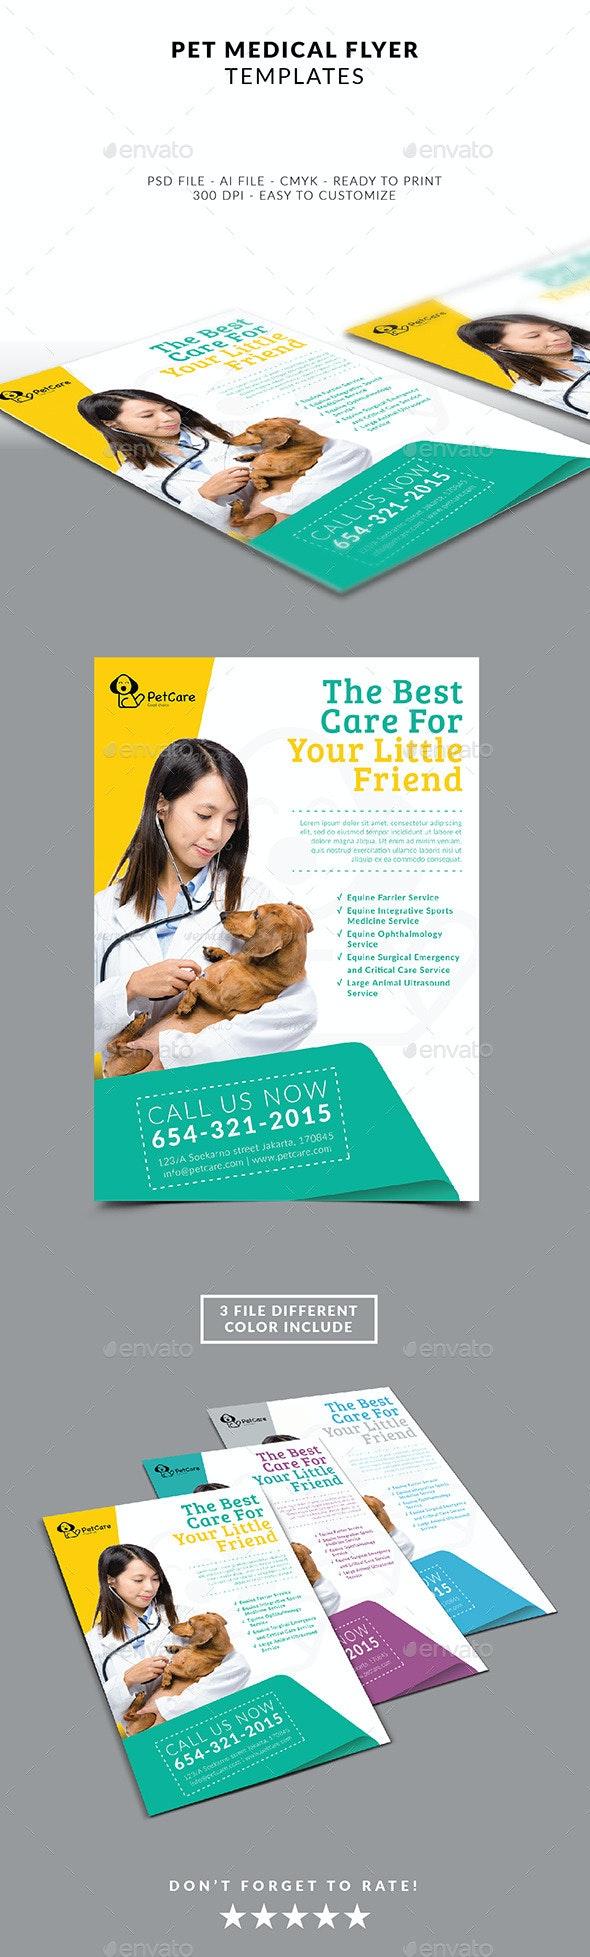 Pet Services Flyer Template - Flyers Print Templates